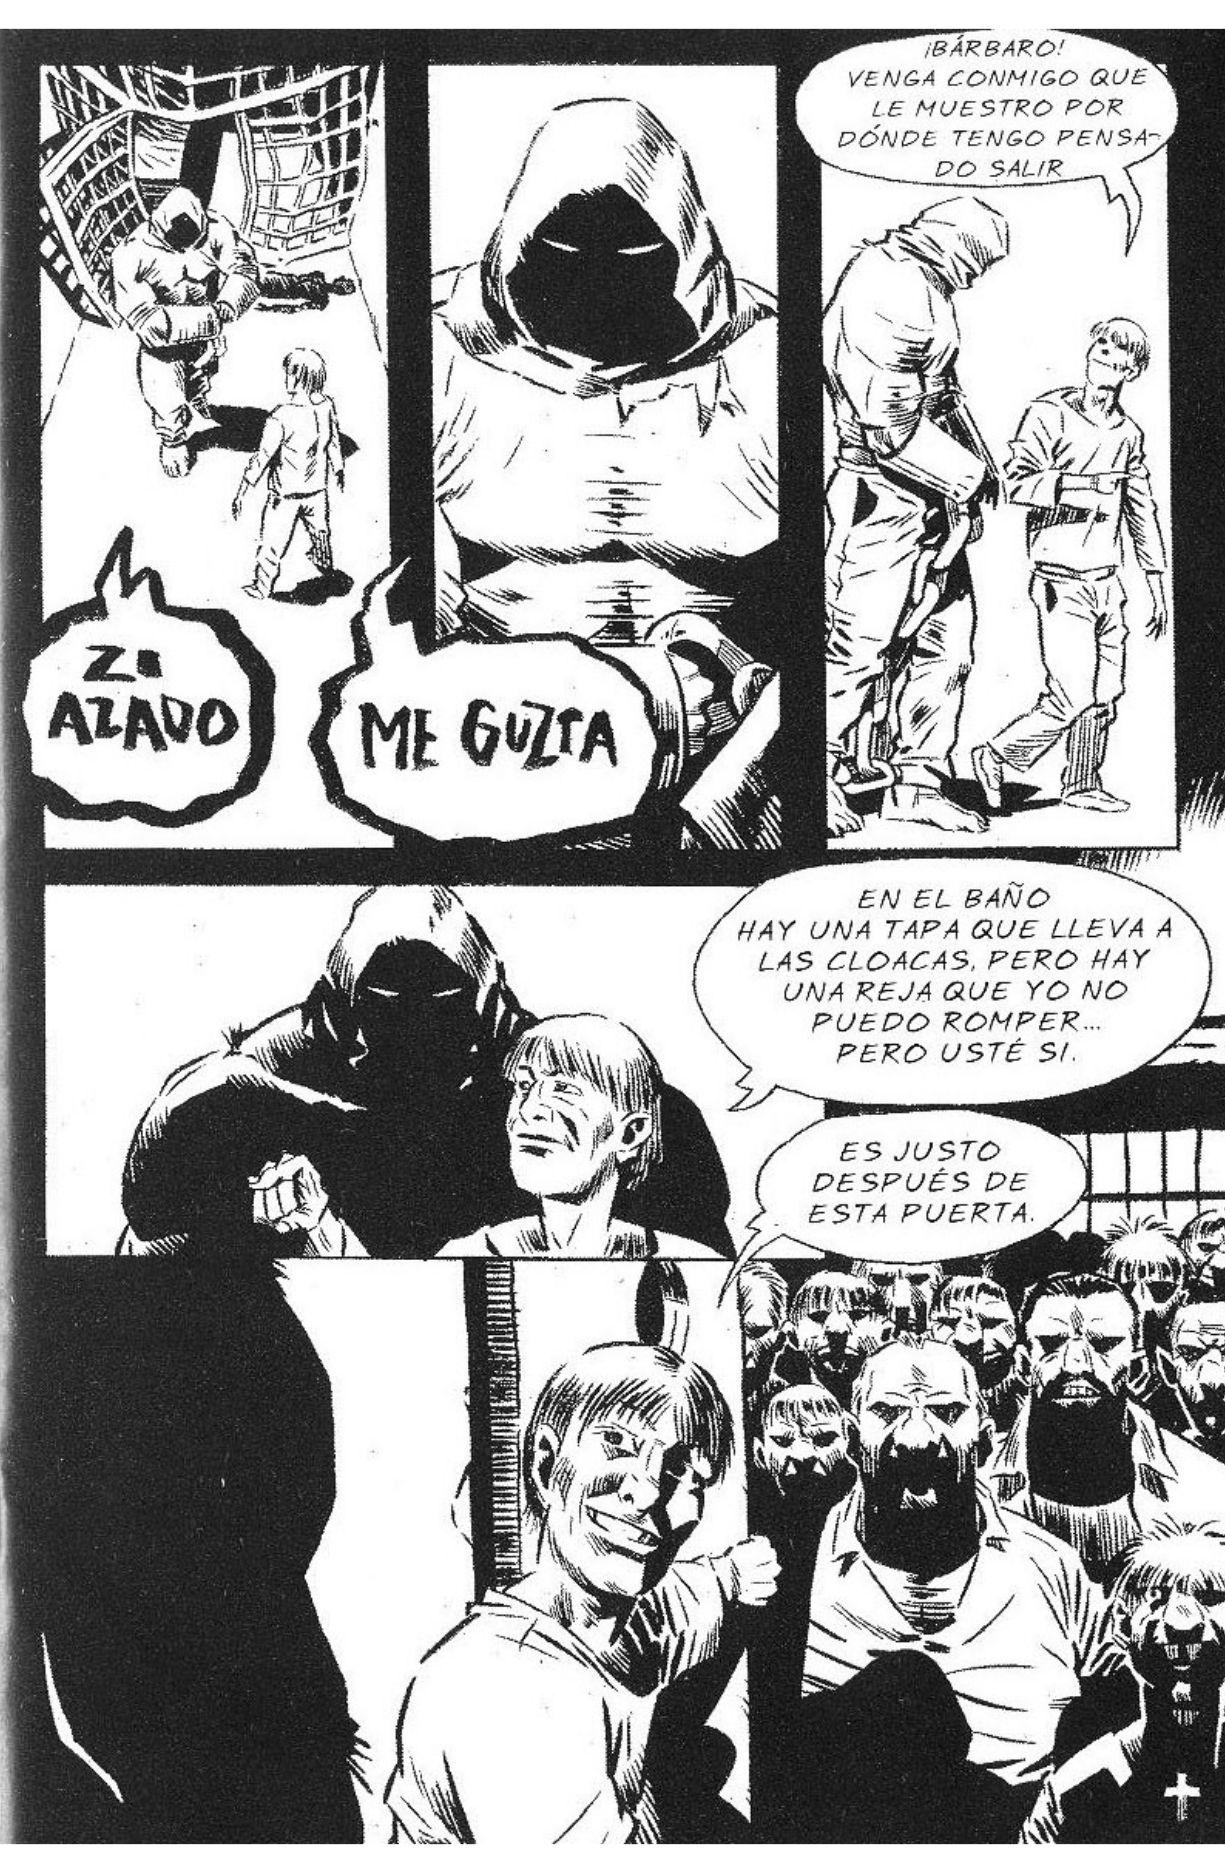 AnimalUrbano05-69